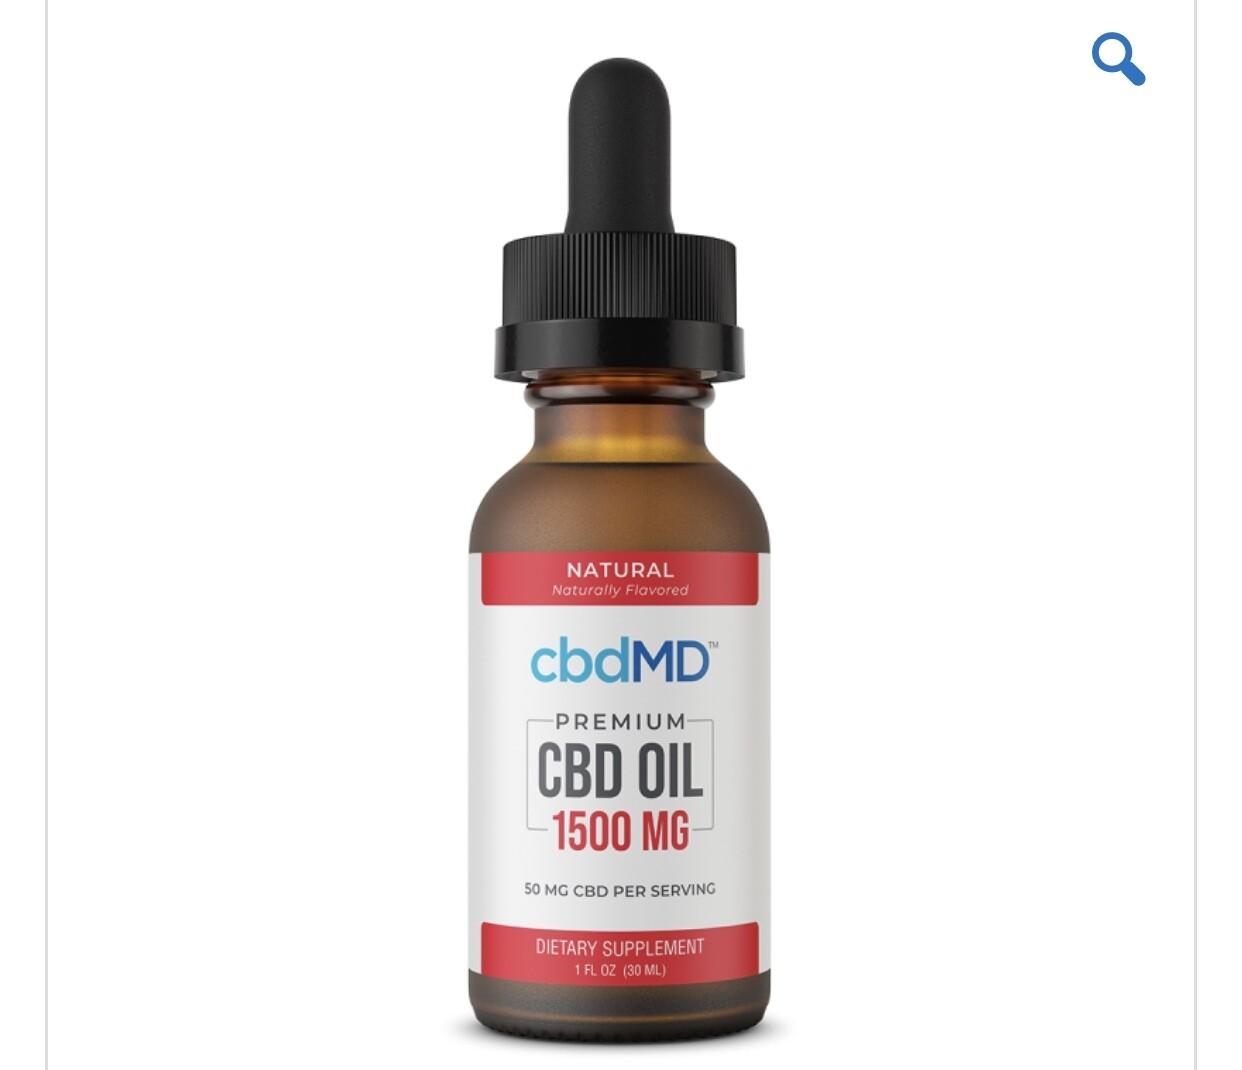 CBDMD 1500 mg Berry Oil